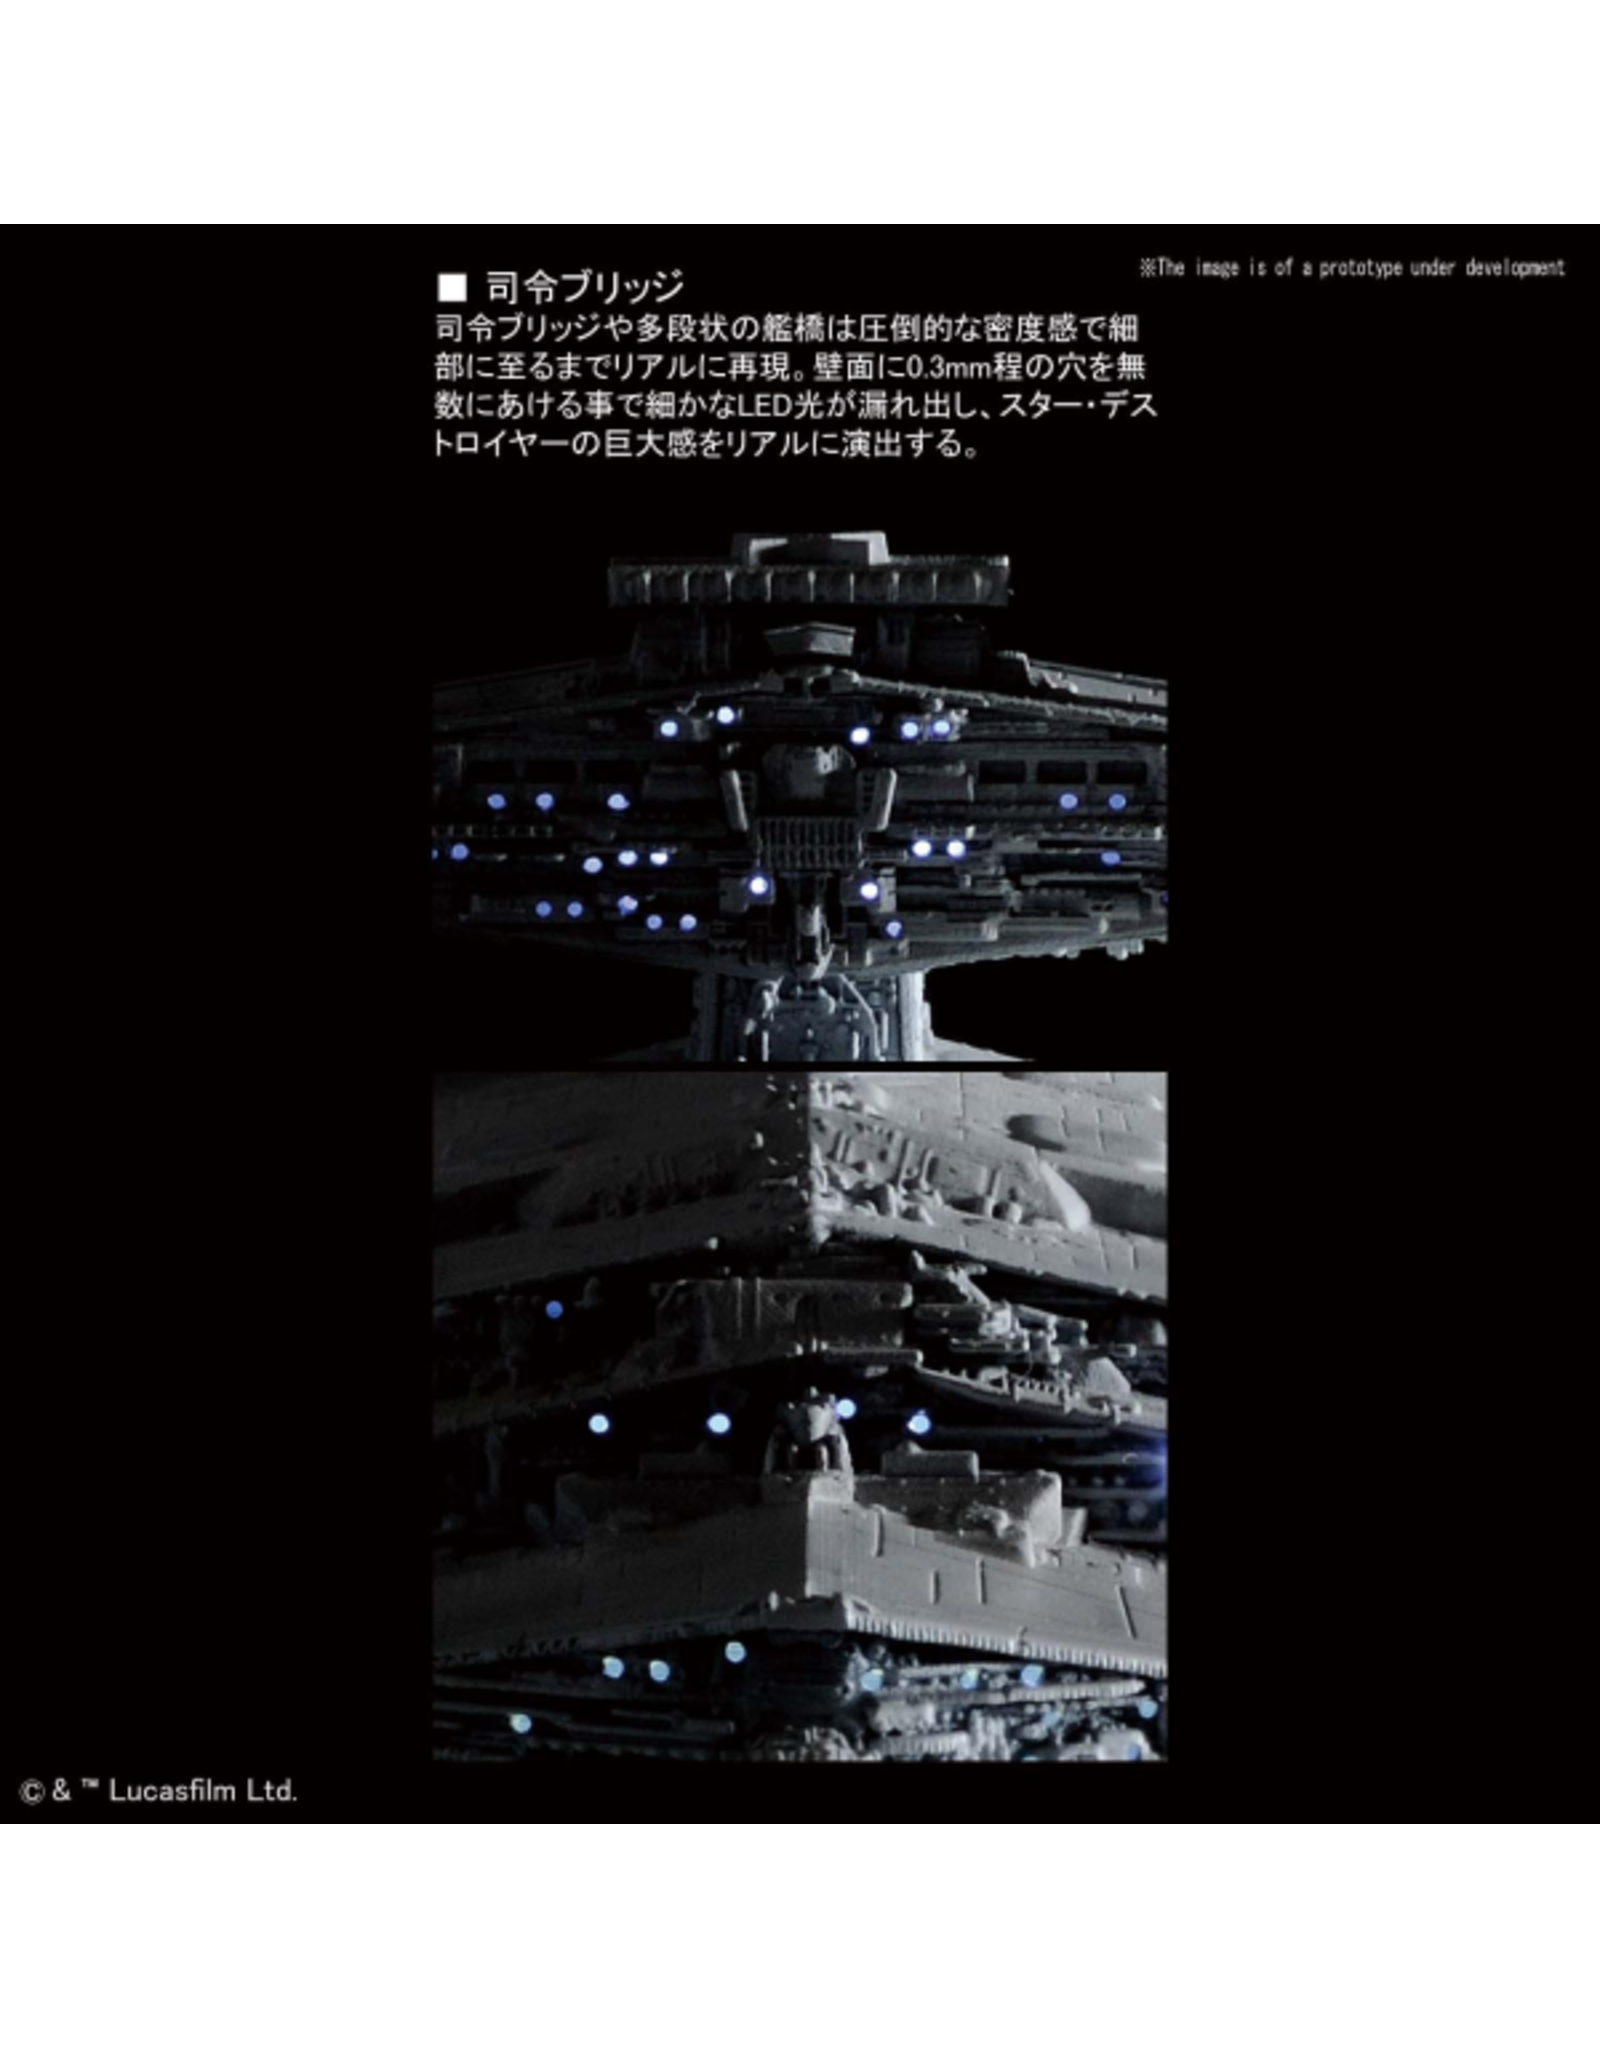 BANDAI 1:5000 STAR DESTROYER [LIGHTING MODEL] LIMITED EDITION